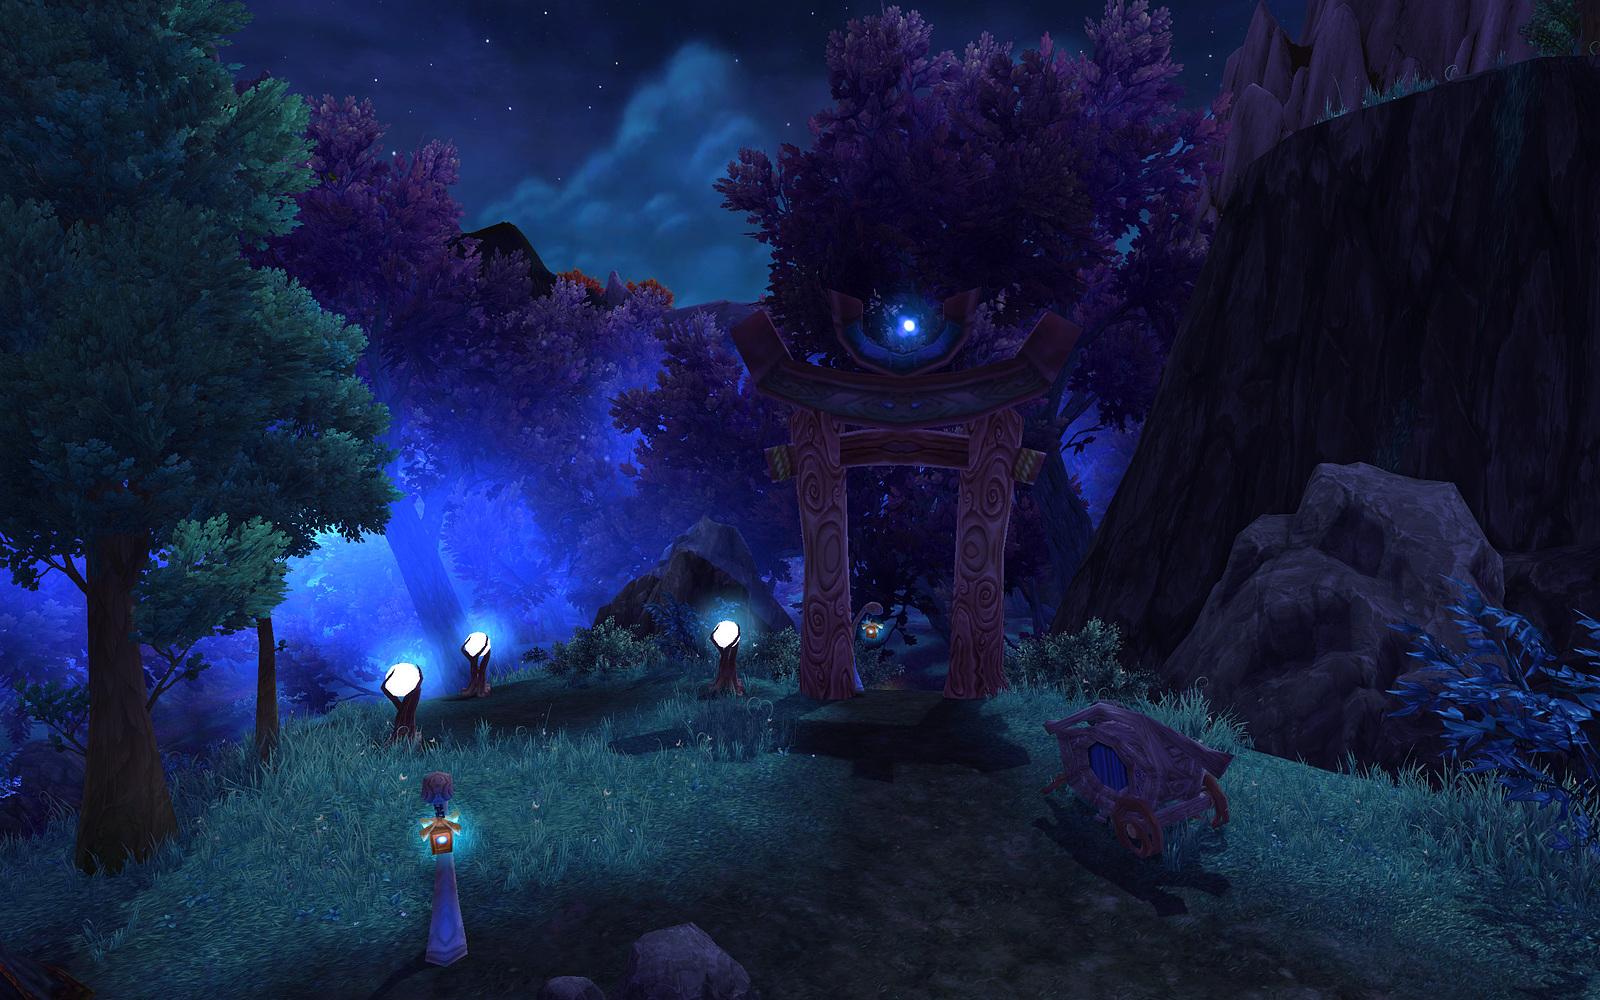 Screenshot de l'extension World of Warcraft: Warlords of Draenor.